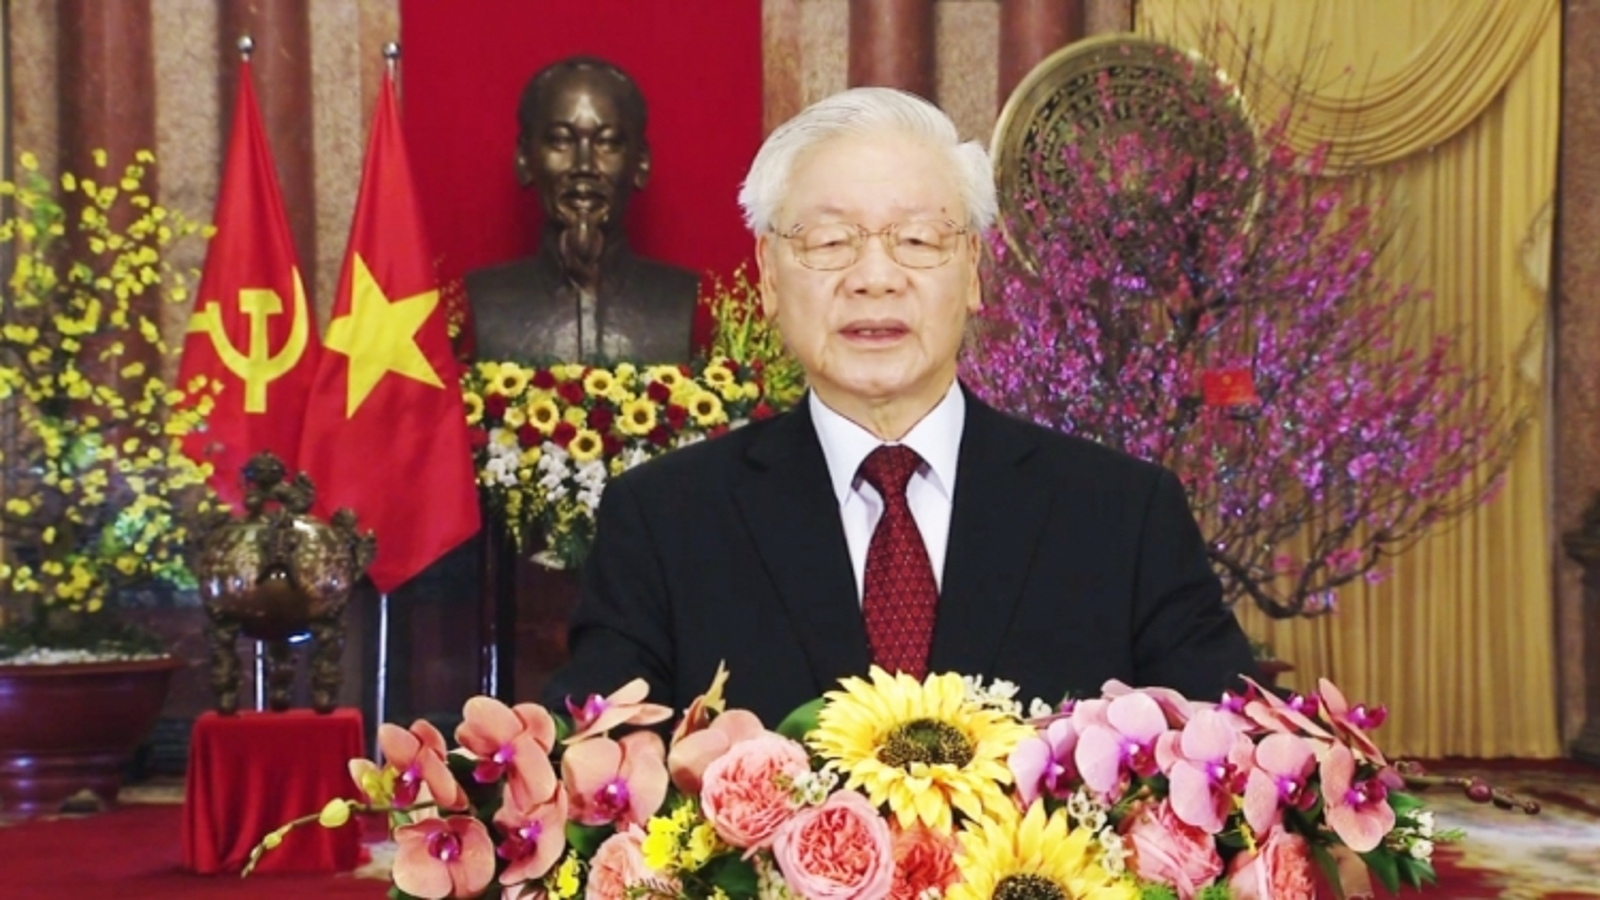 Top Vietnamese leader extends New Year greetings